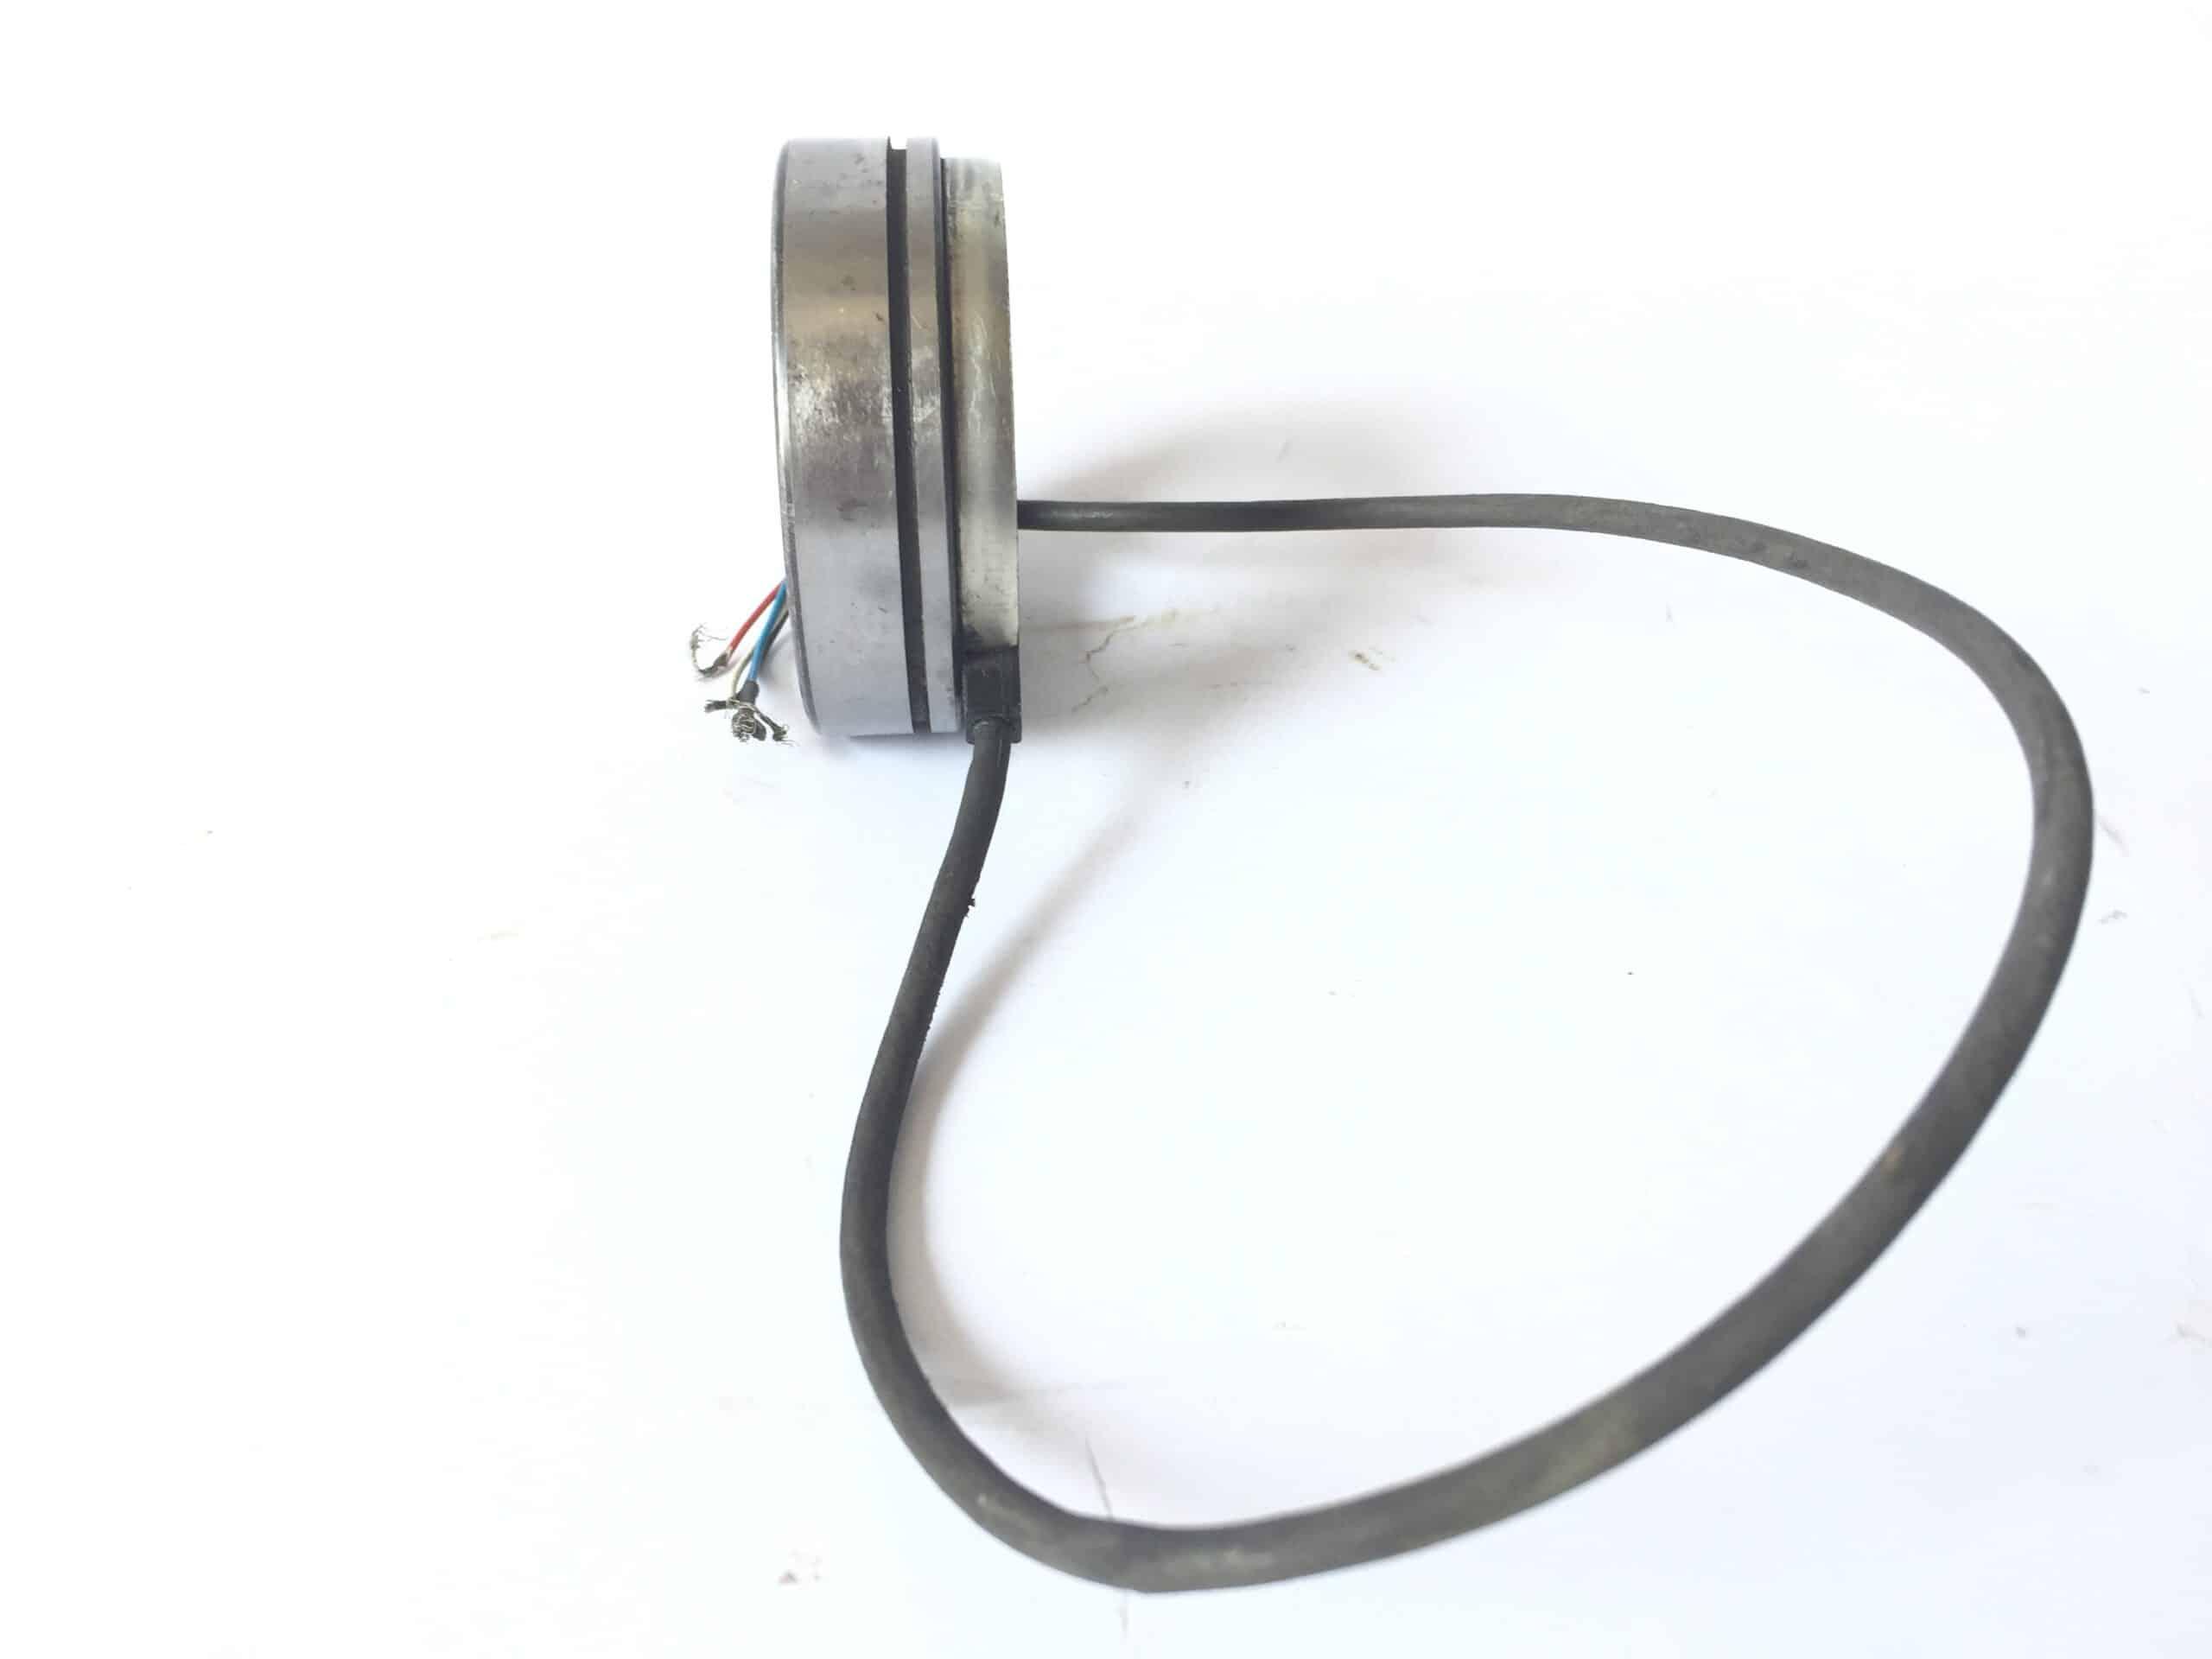   Sensor Bearing w/wire   Fazl-e-Rasheed and Company August 2021